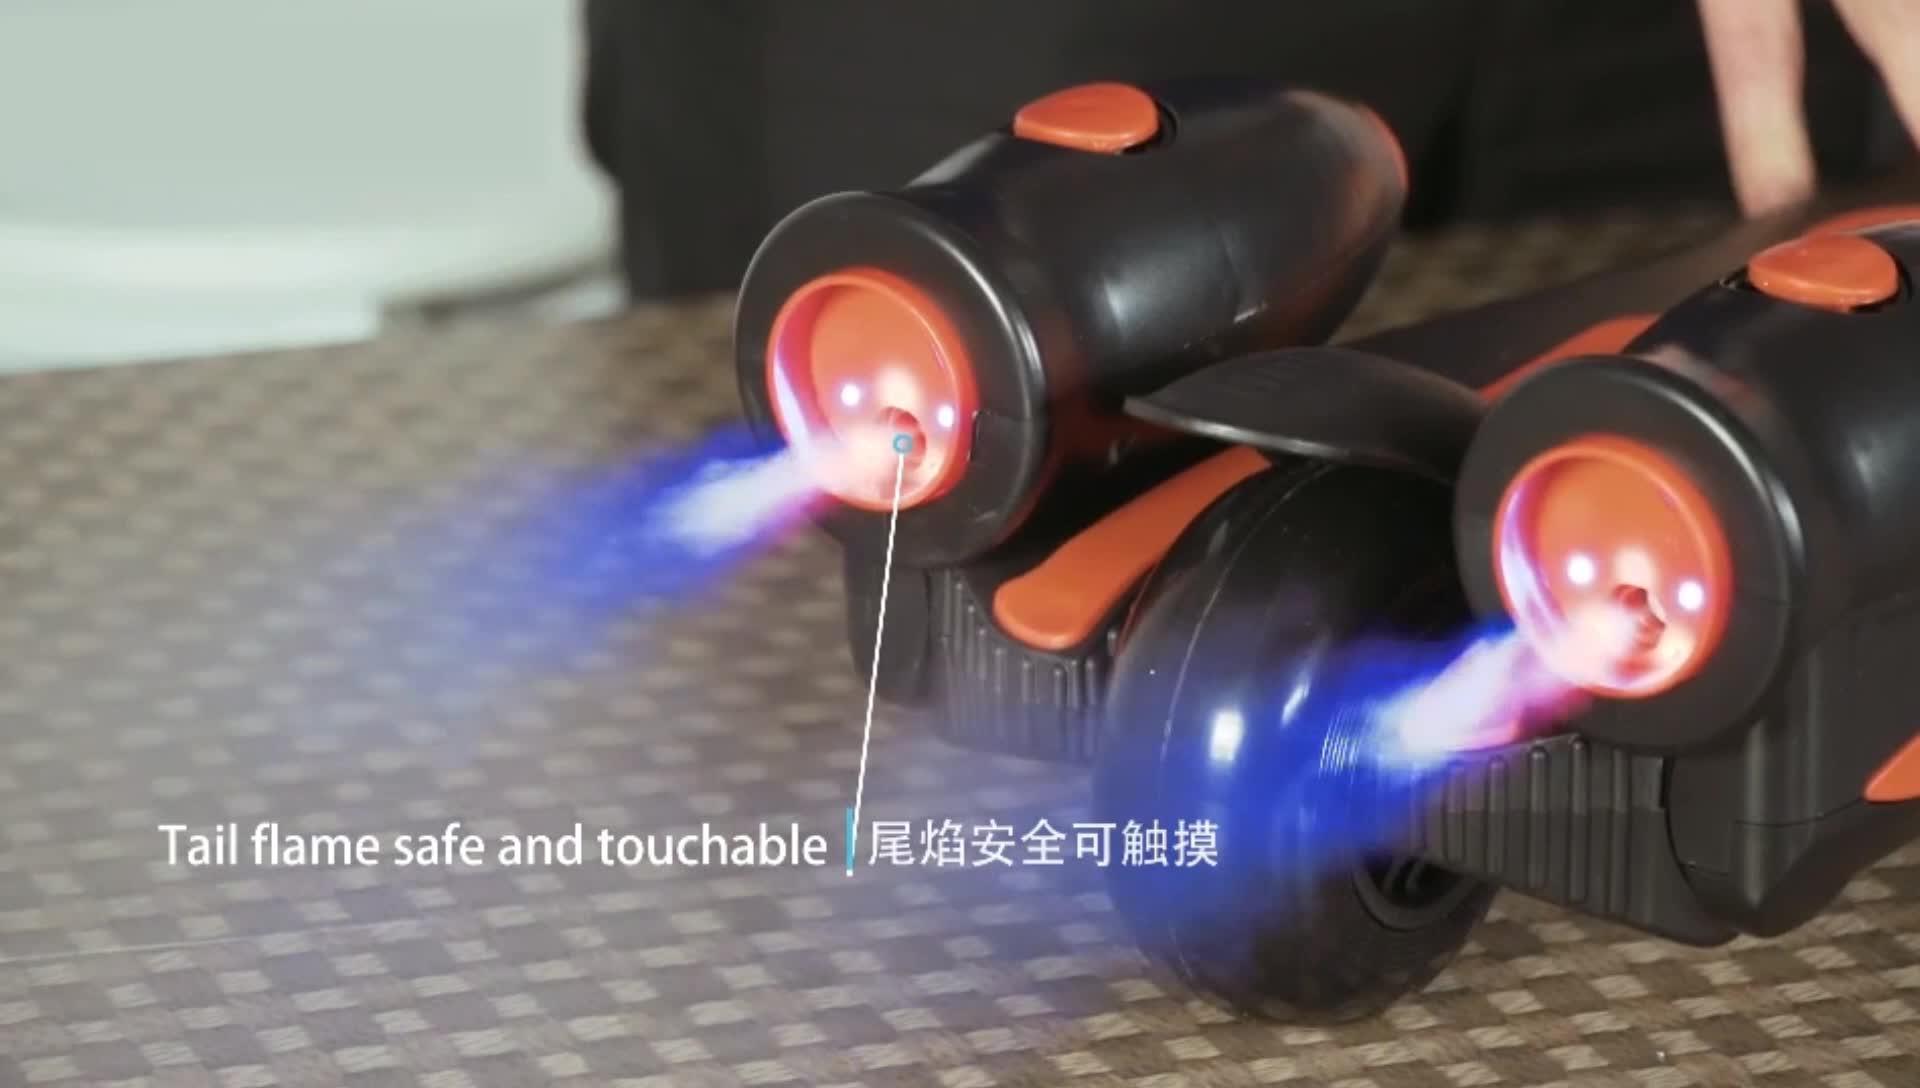 Adjustable height 3 flashing wheel kids electric spray kick scooter